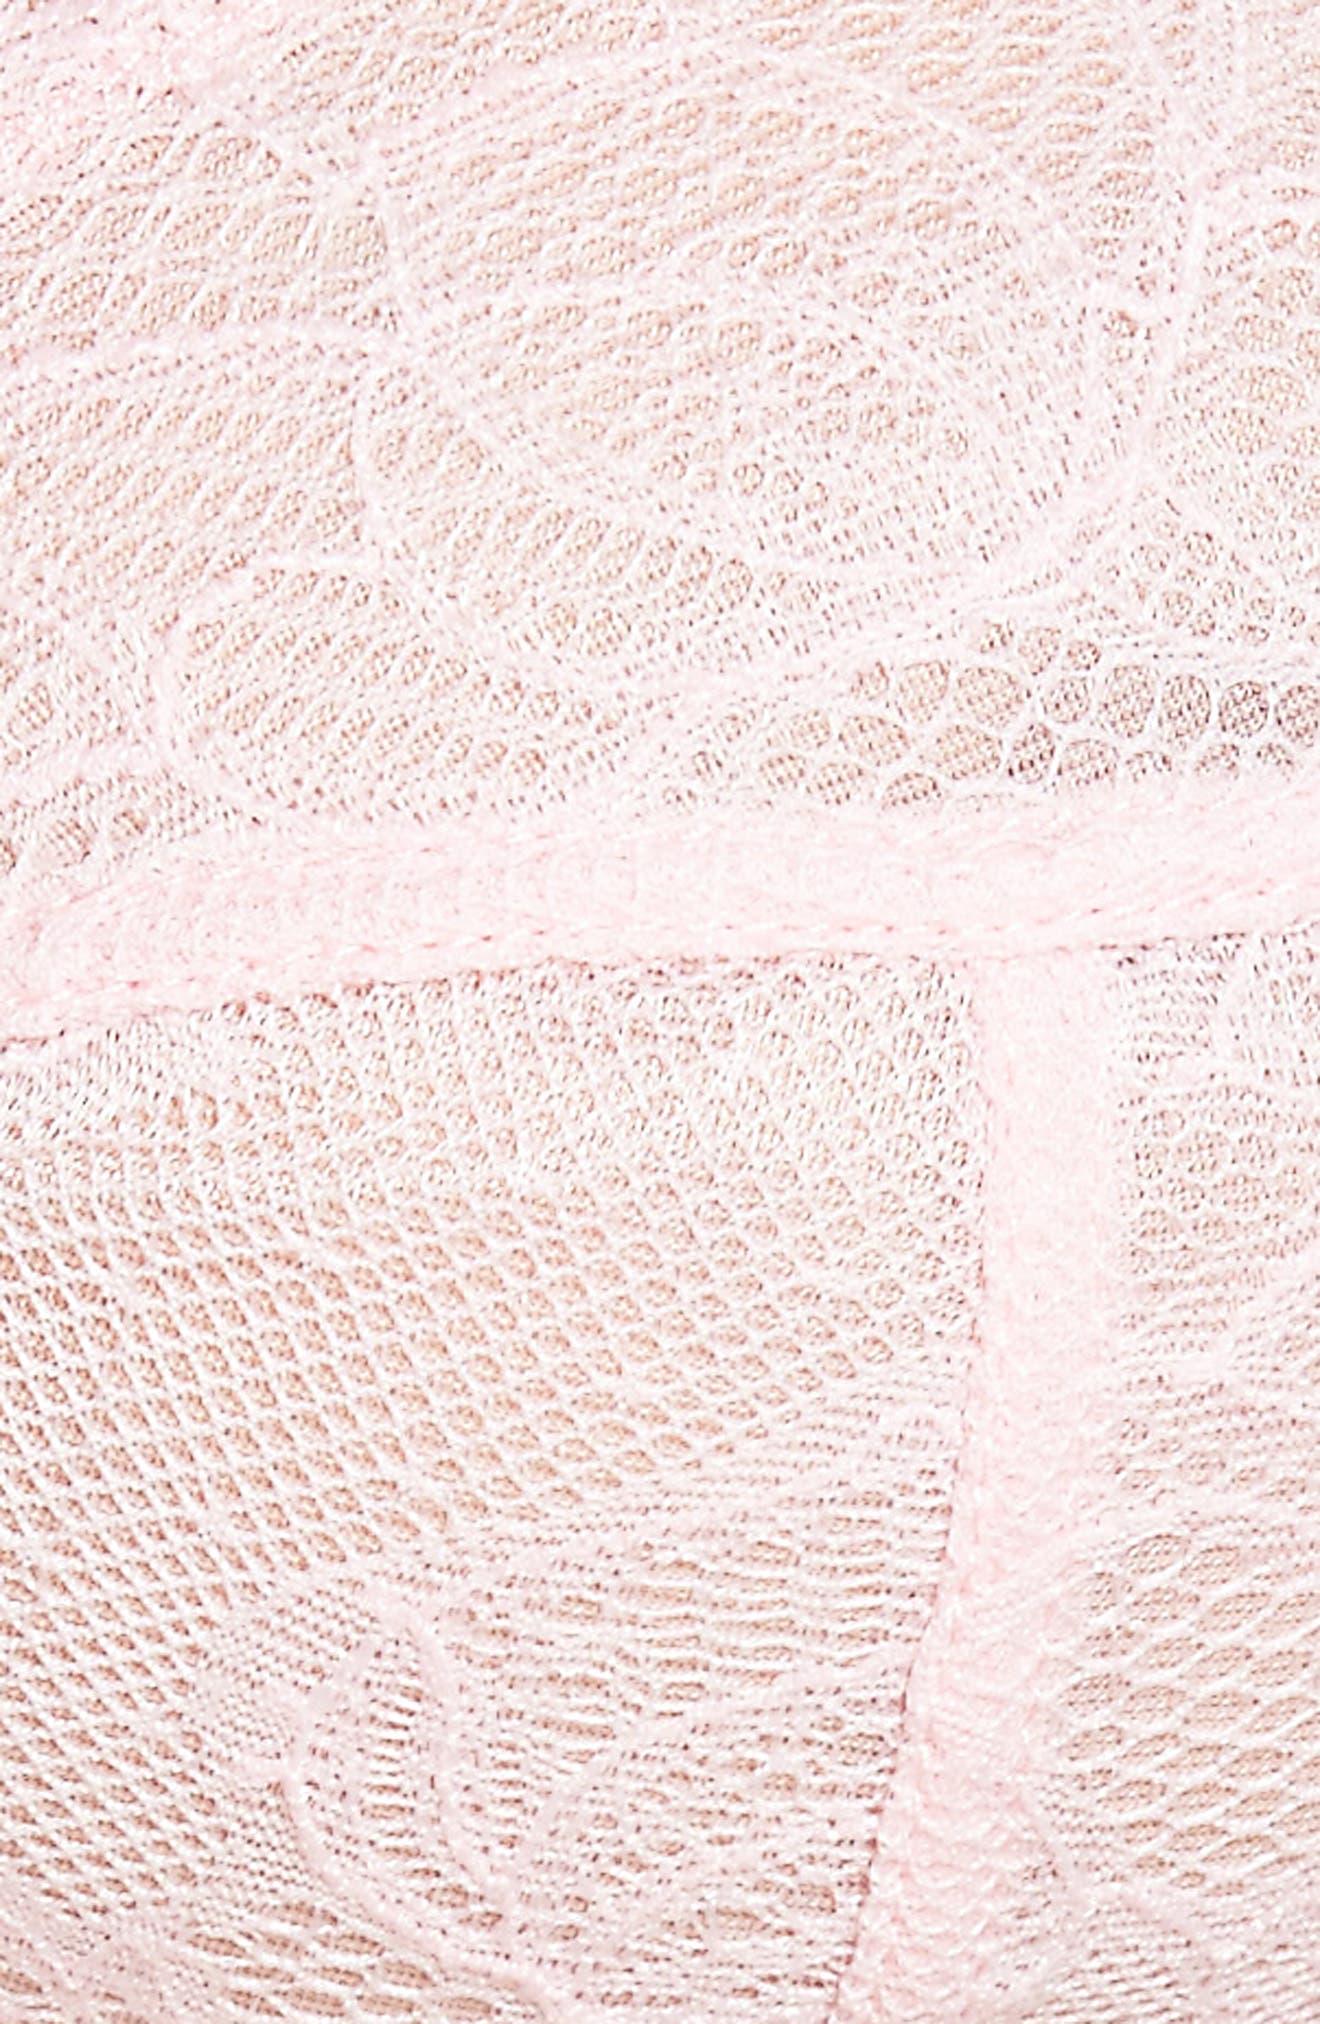 Seductive Comfort Lace Bikini,                             Alternate thumbnail 9, color,                             Attract